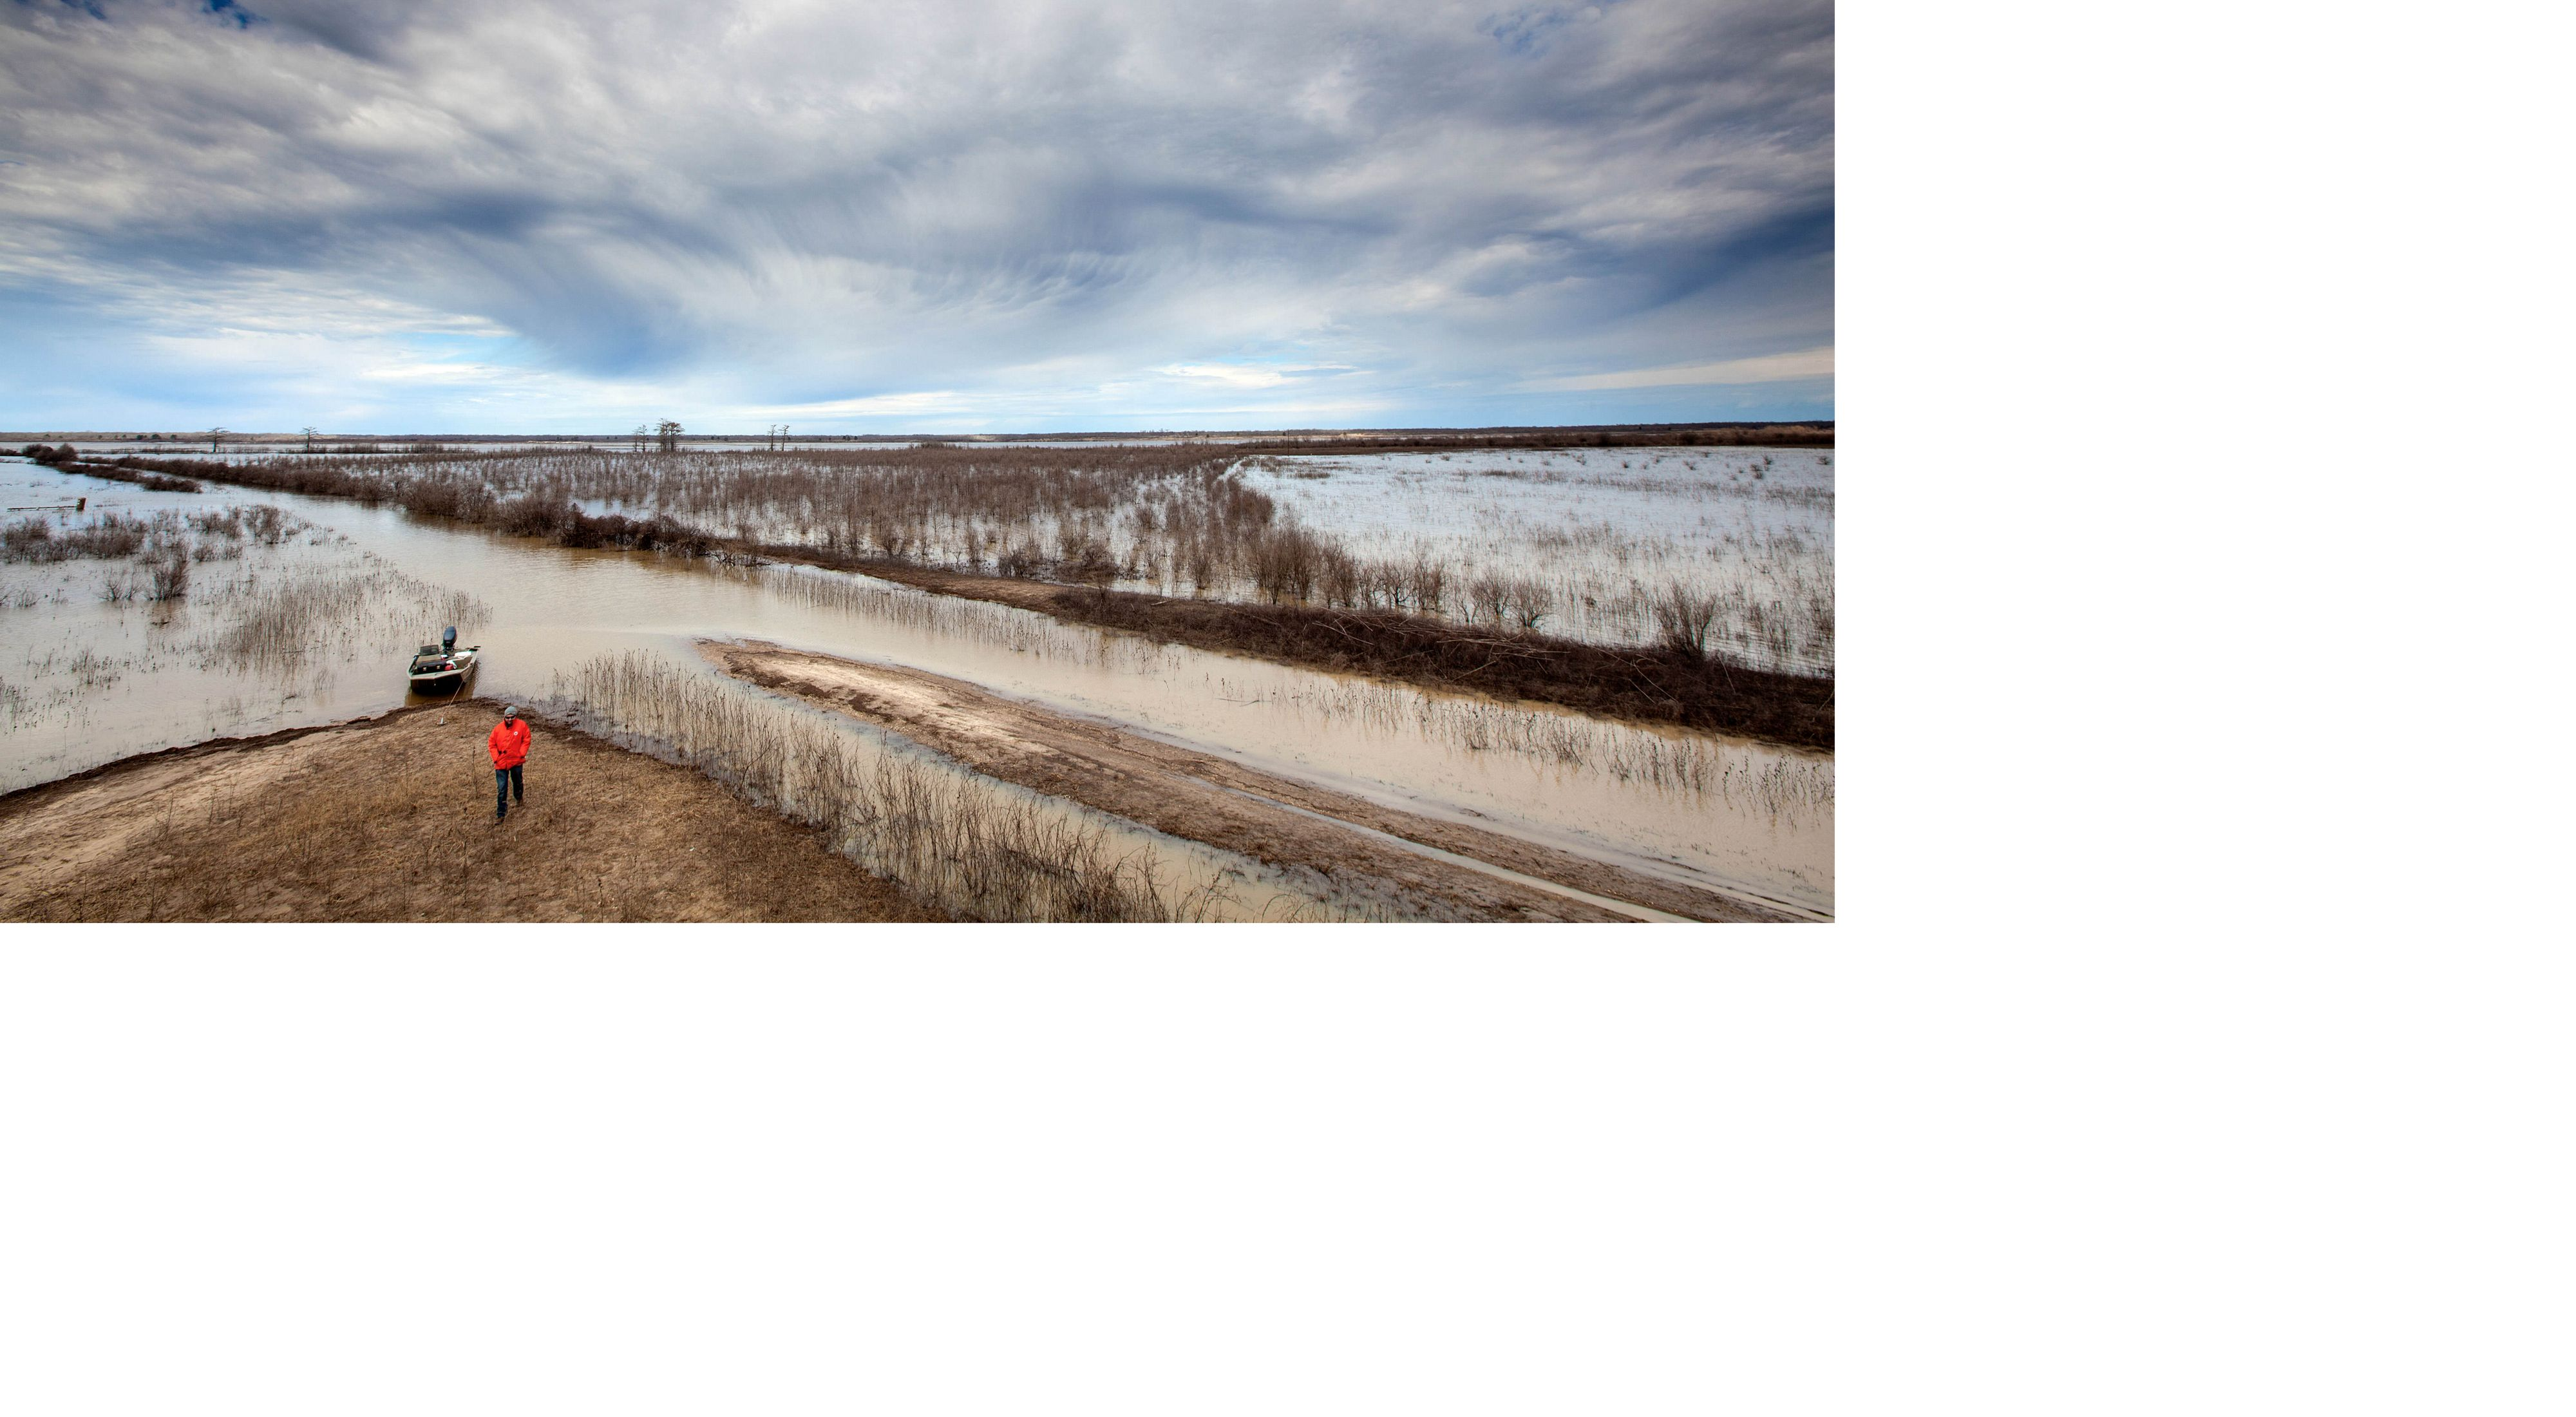 Aerial view of Mollicy Floodplain